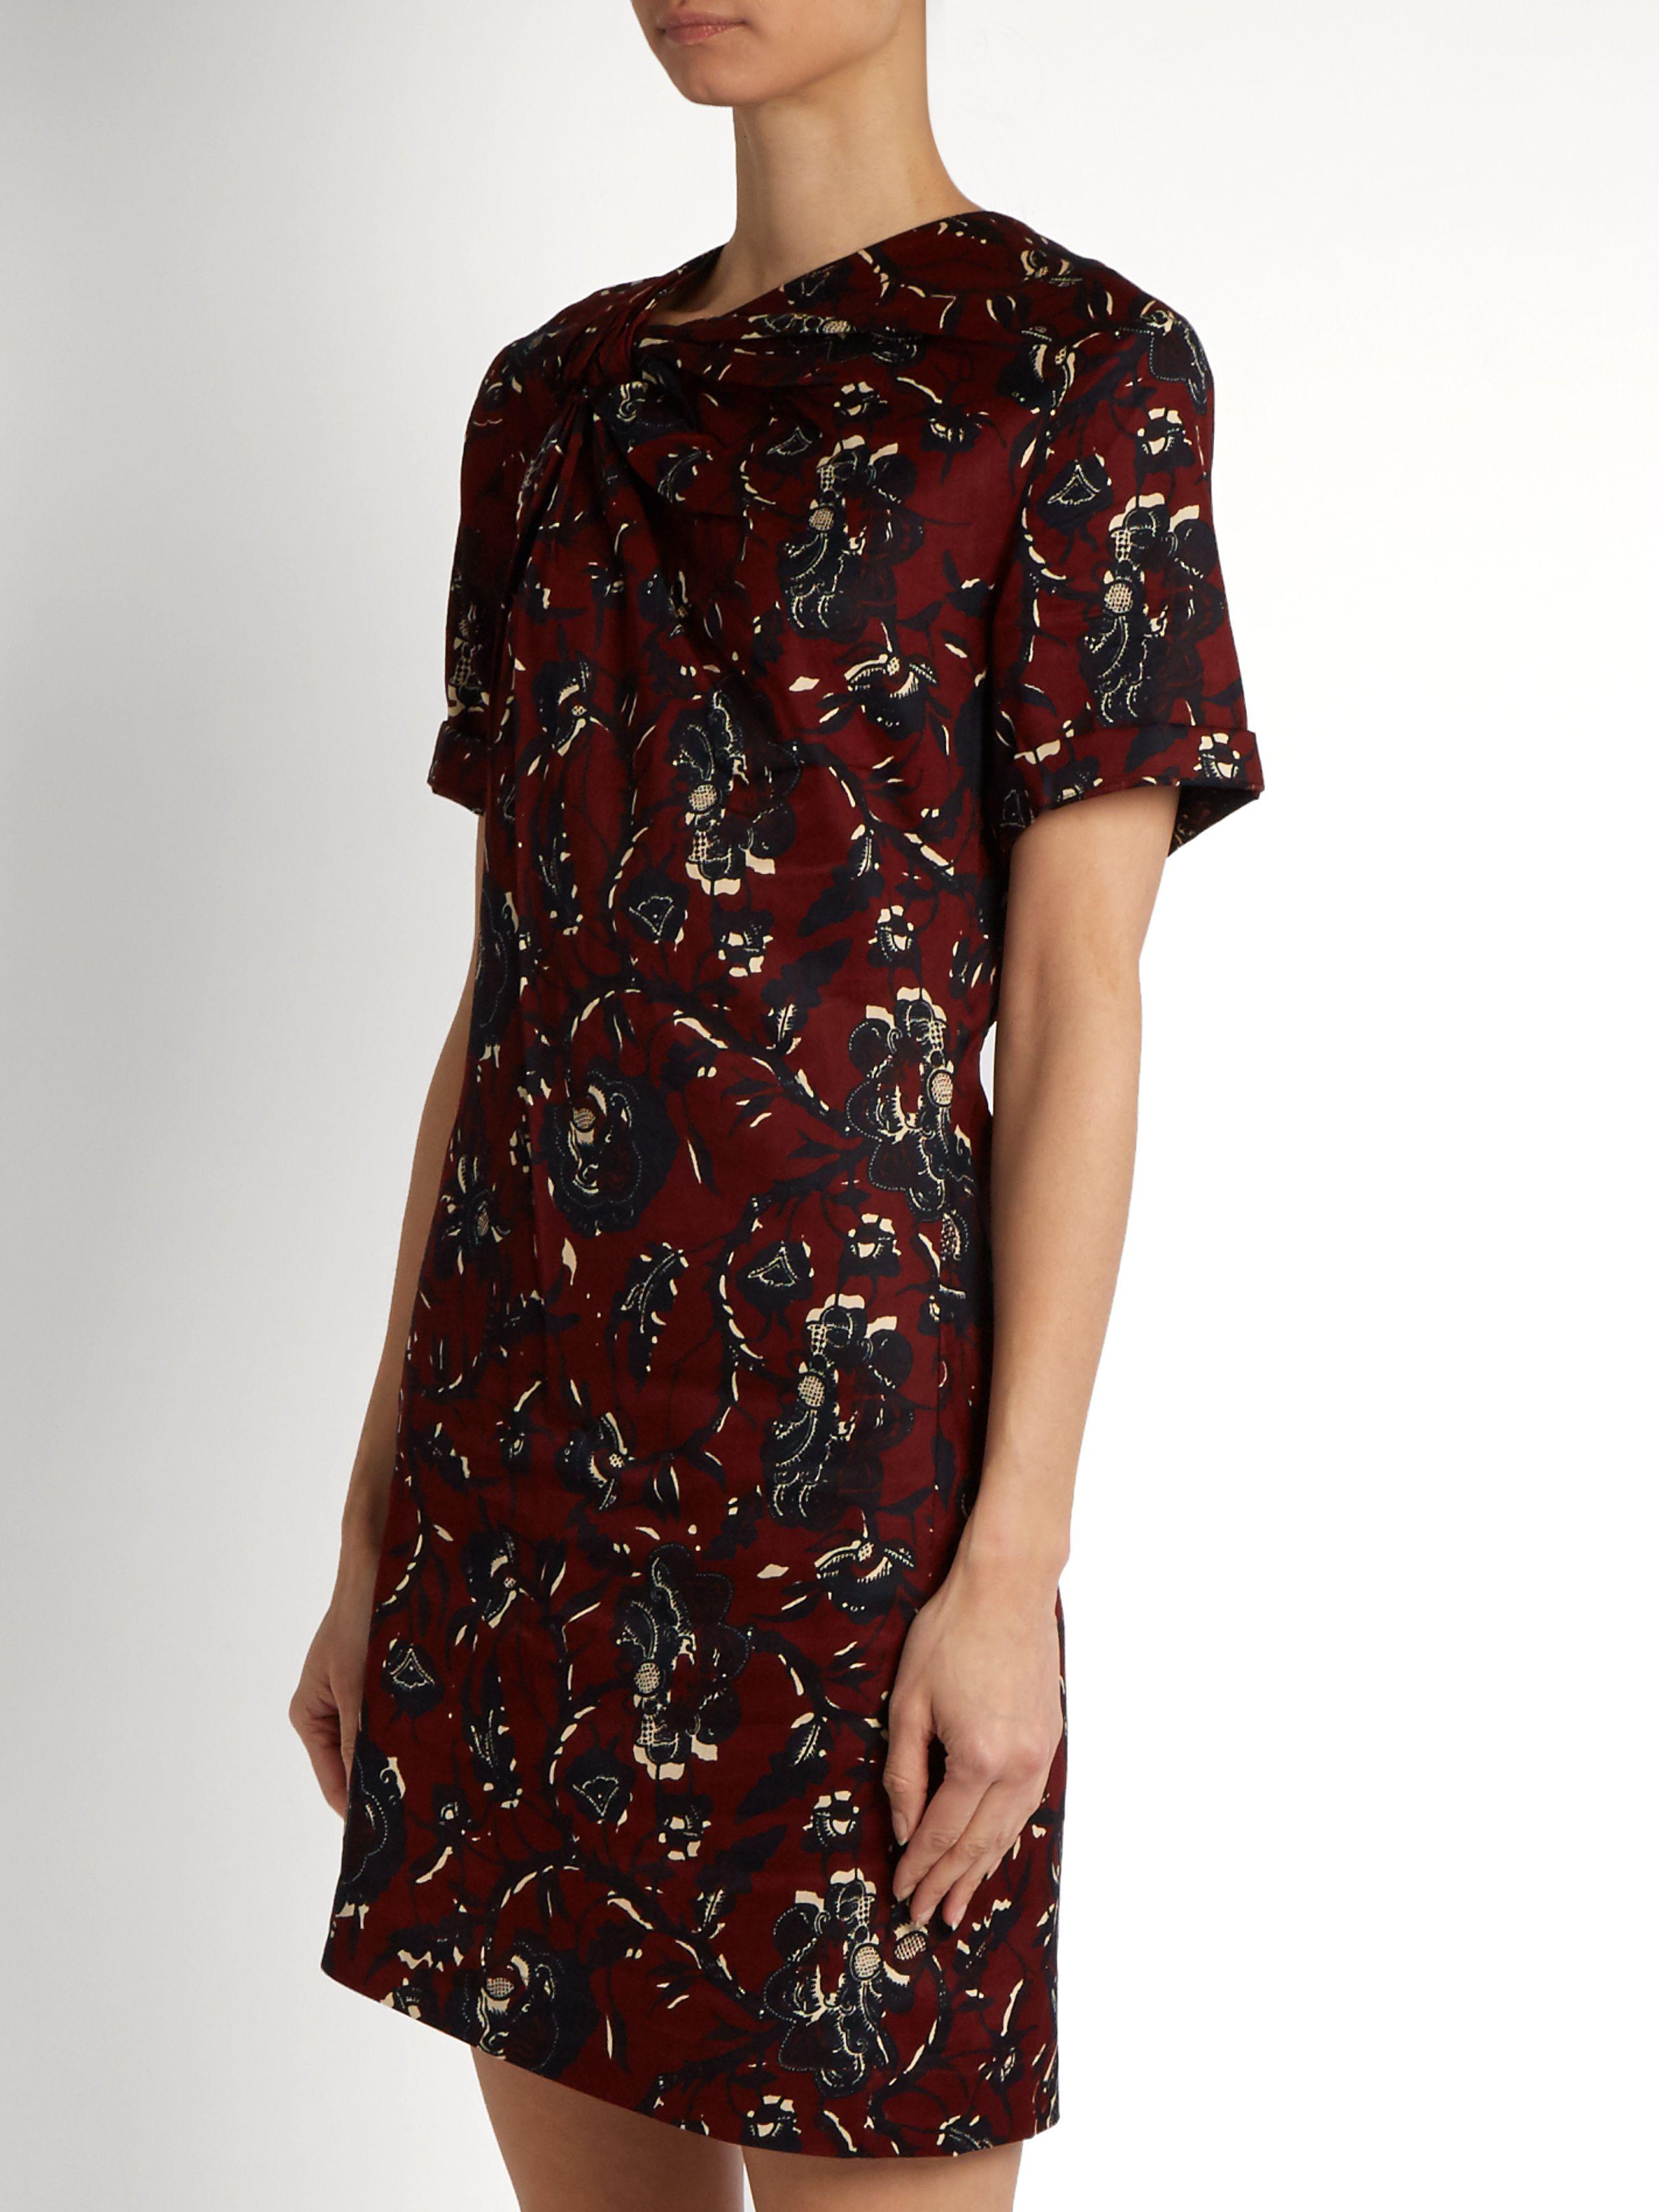 6facf9c3a7aa Jade twist-front floral-print dress   Isabel Marant Étoile    MATCHESFASHION.COM